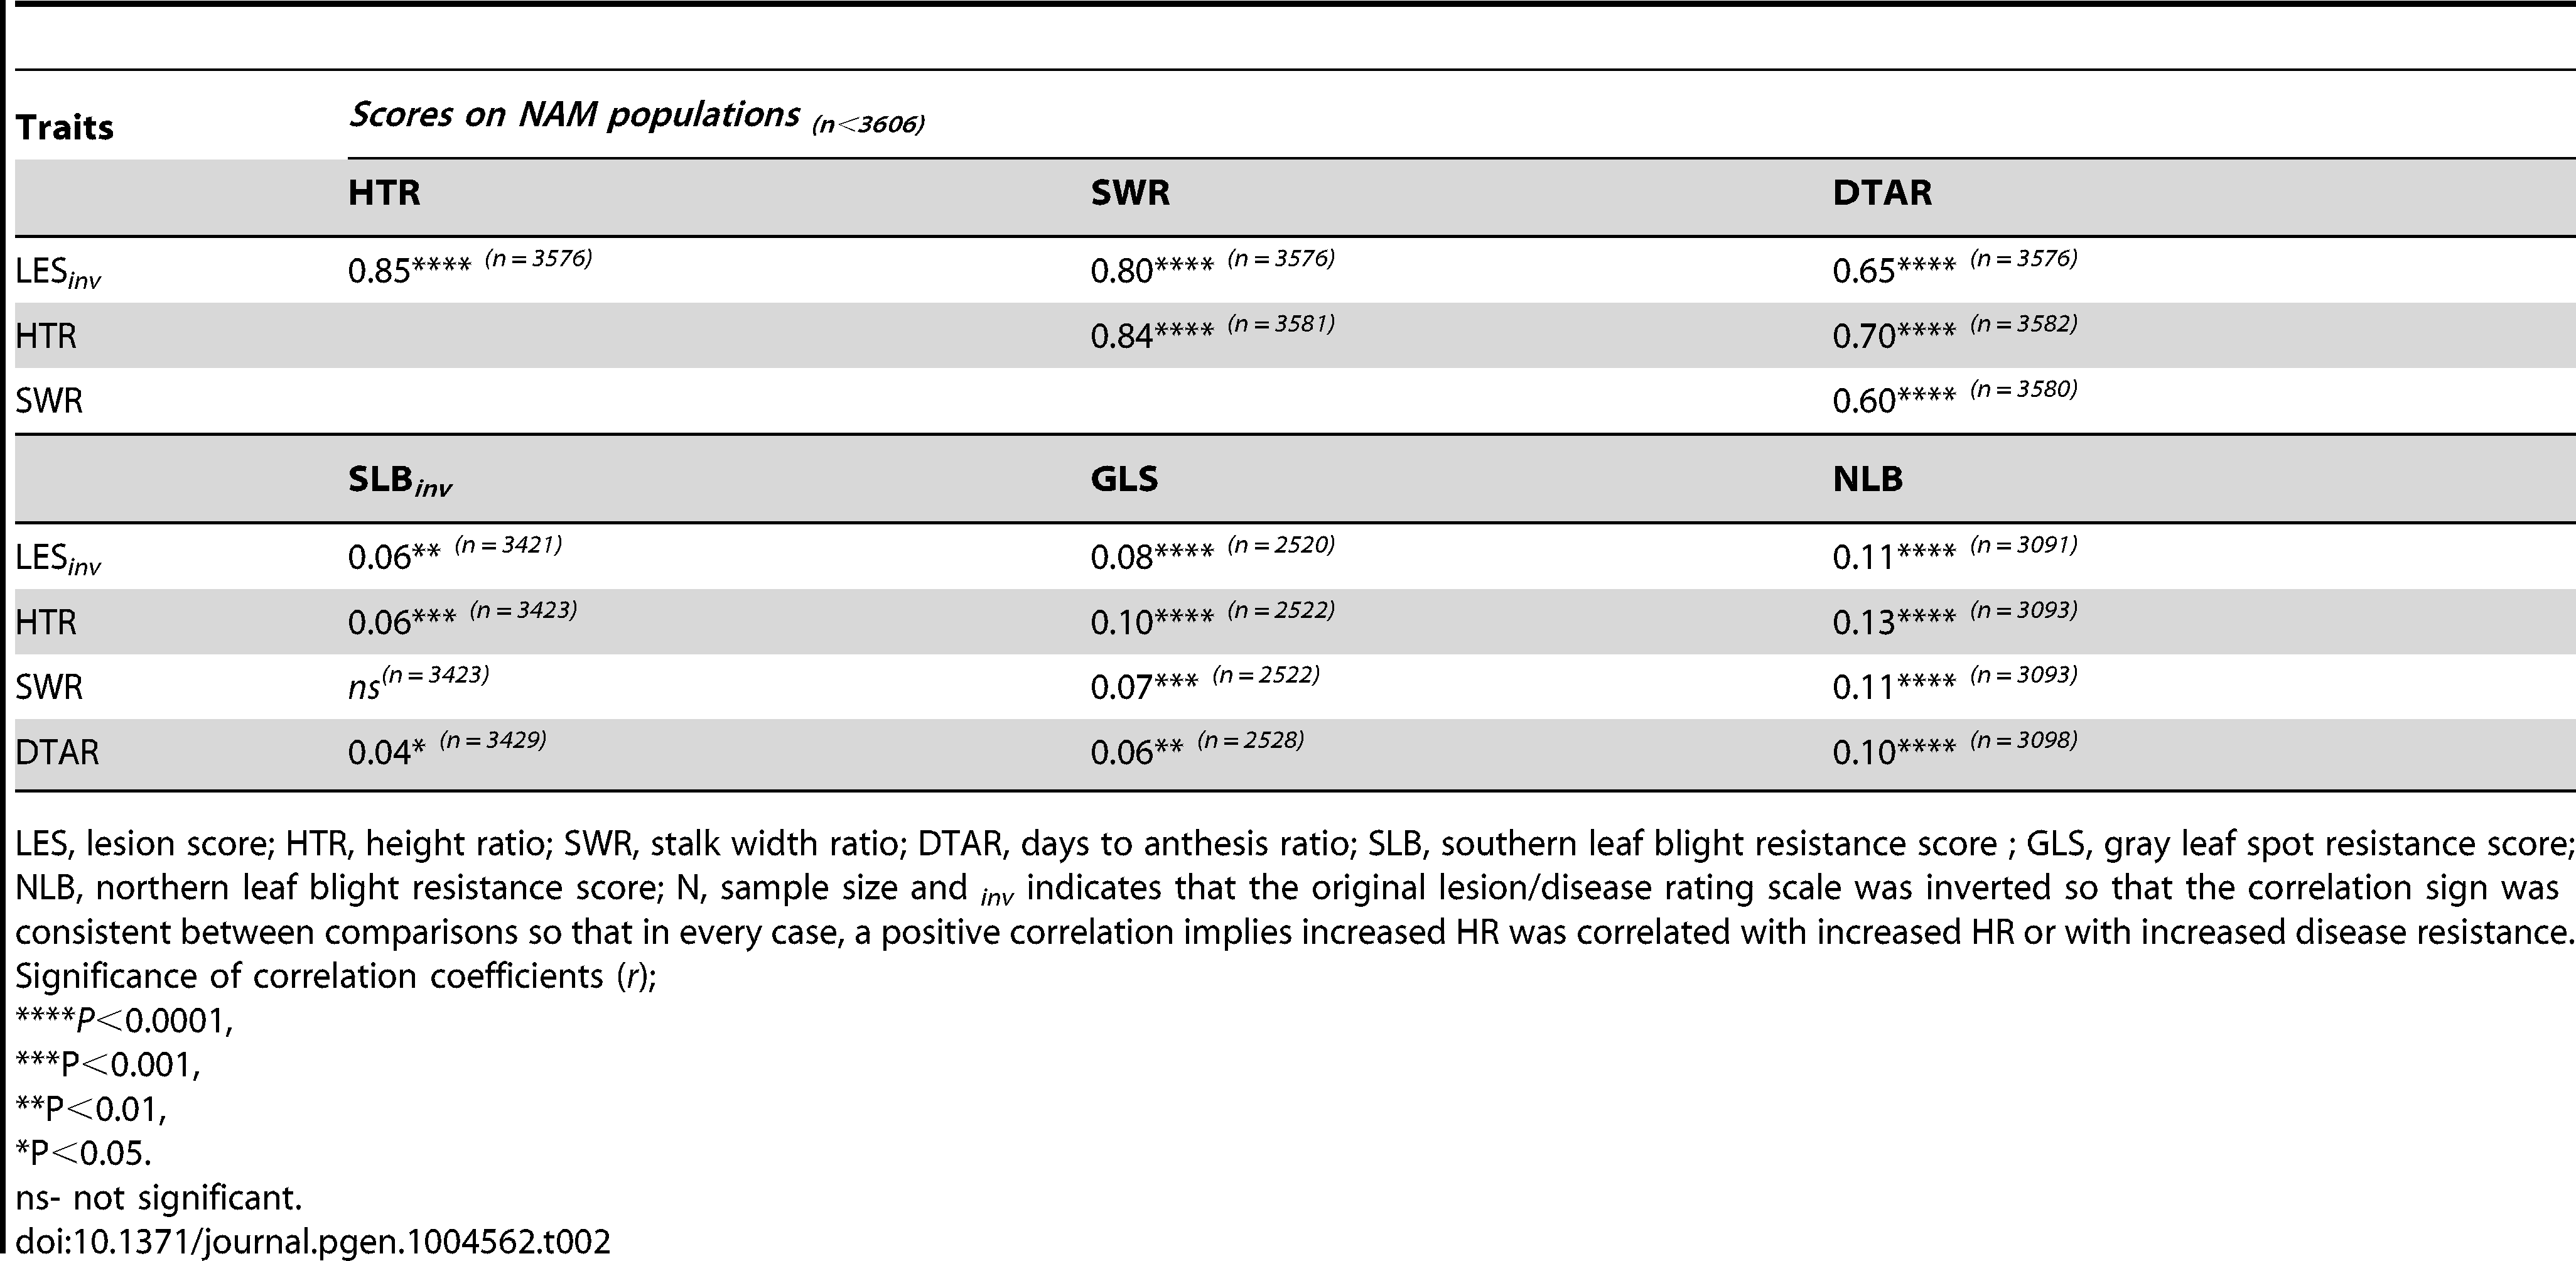 Correlation coefficients between mean values of NAM RILs for lesion mimic traits and disease resistance score values obtained from previous studies (SLB, Kump et al. <em class=&quot;ref&quot;>[34]</em>; NLB, Poland et al. <em class=&quot;ref&quot;>[35]</em>; GLS, Benson <em class=&quot;ref&quot;>[33]</em>).